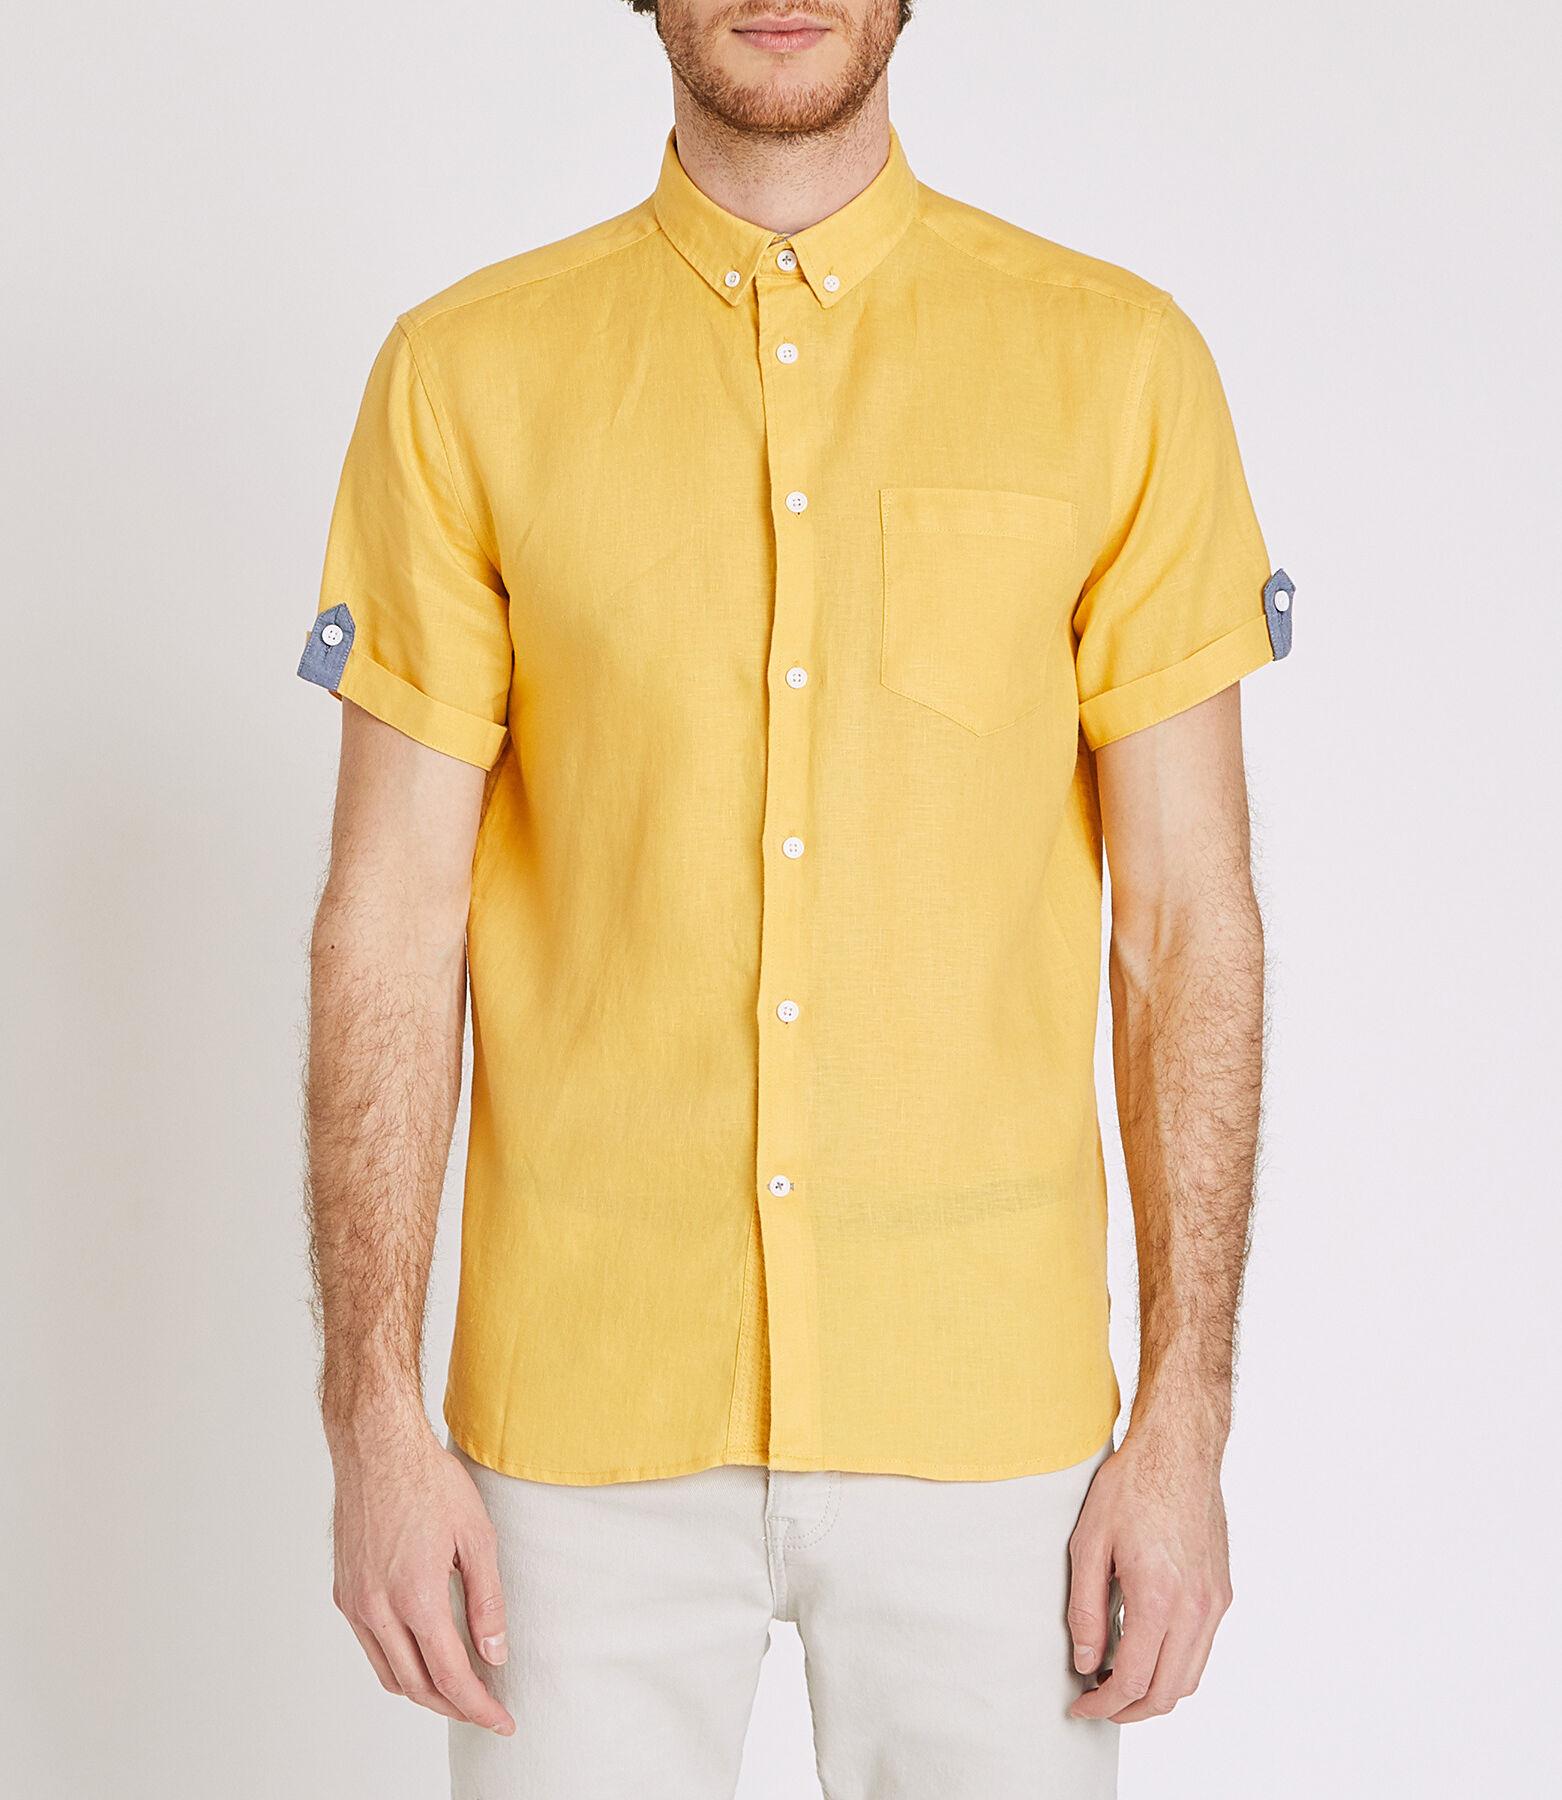 Chemise Sportswear Jaune